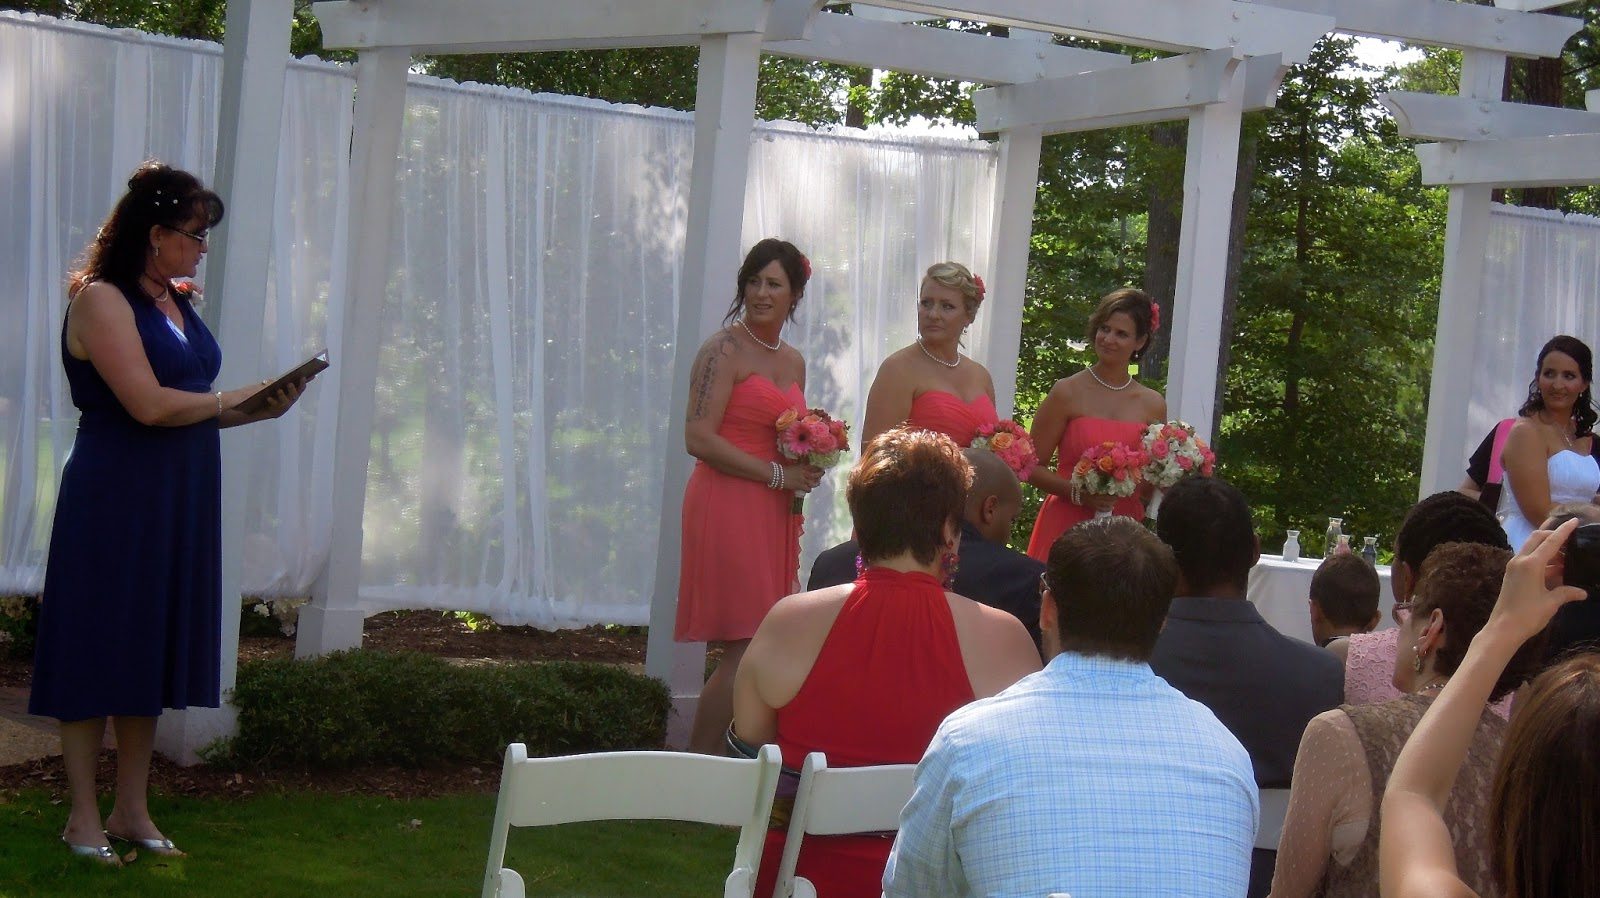 Raleigh Wedding Blog: Melissa And Chris' Beautiful Wedding